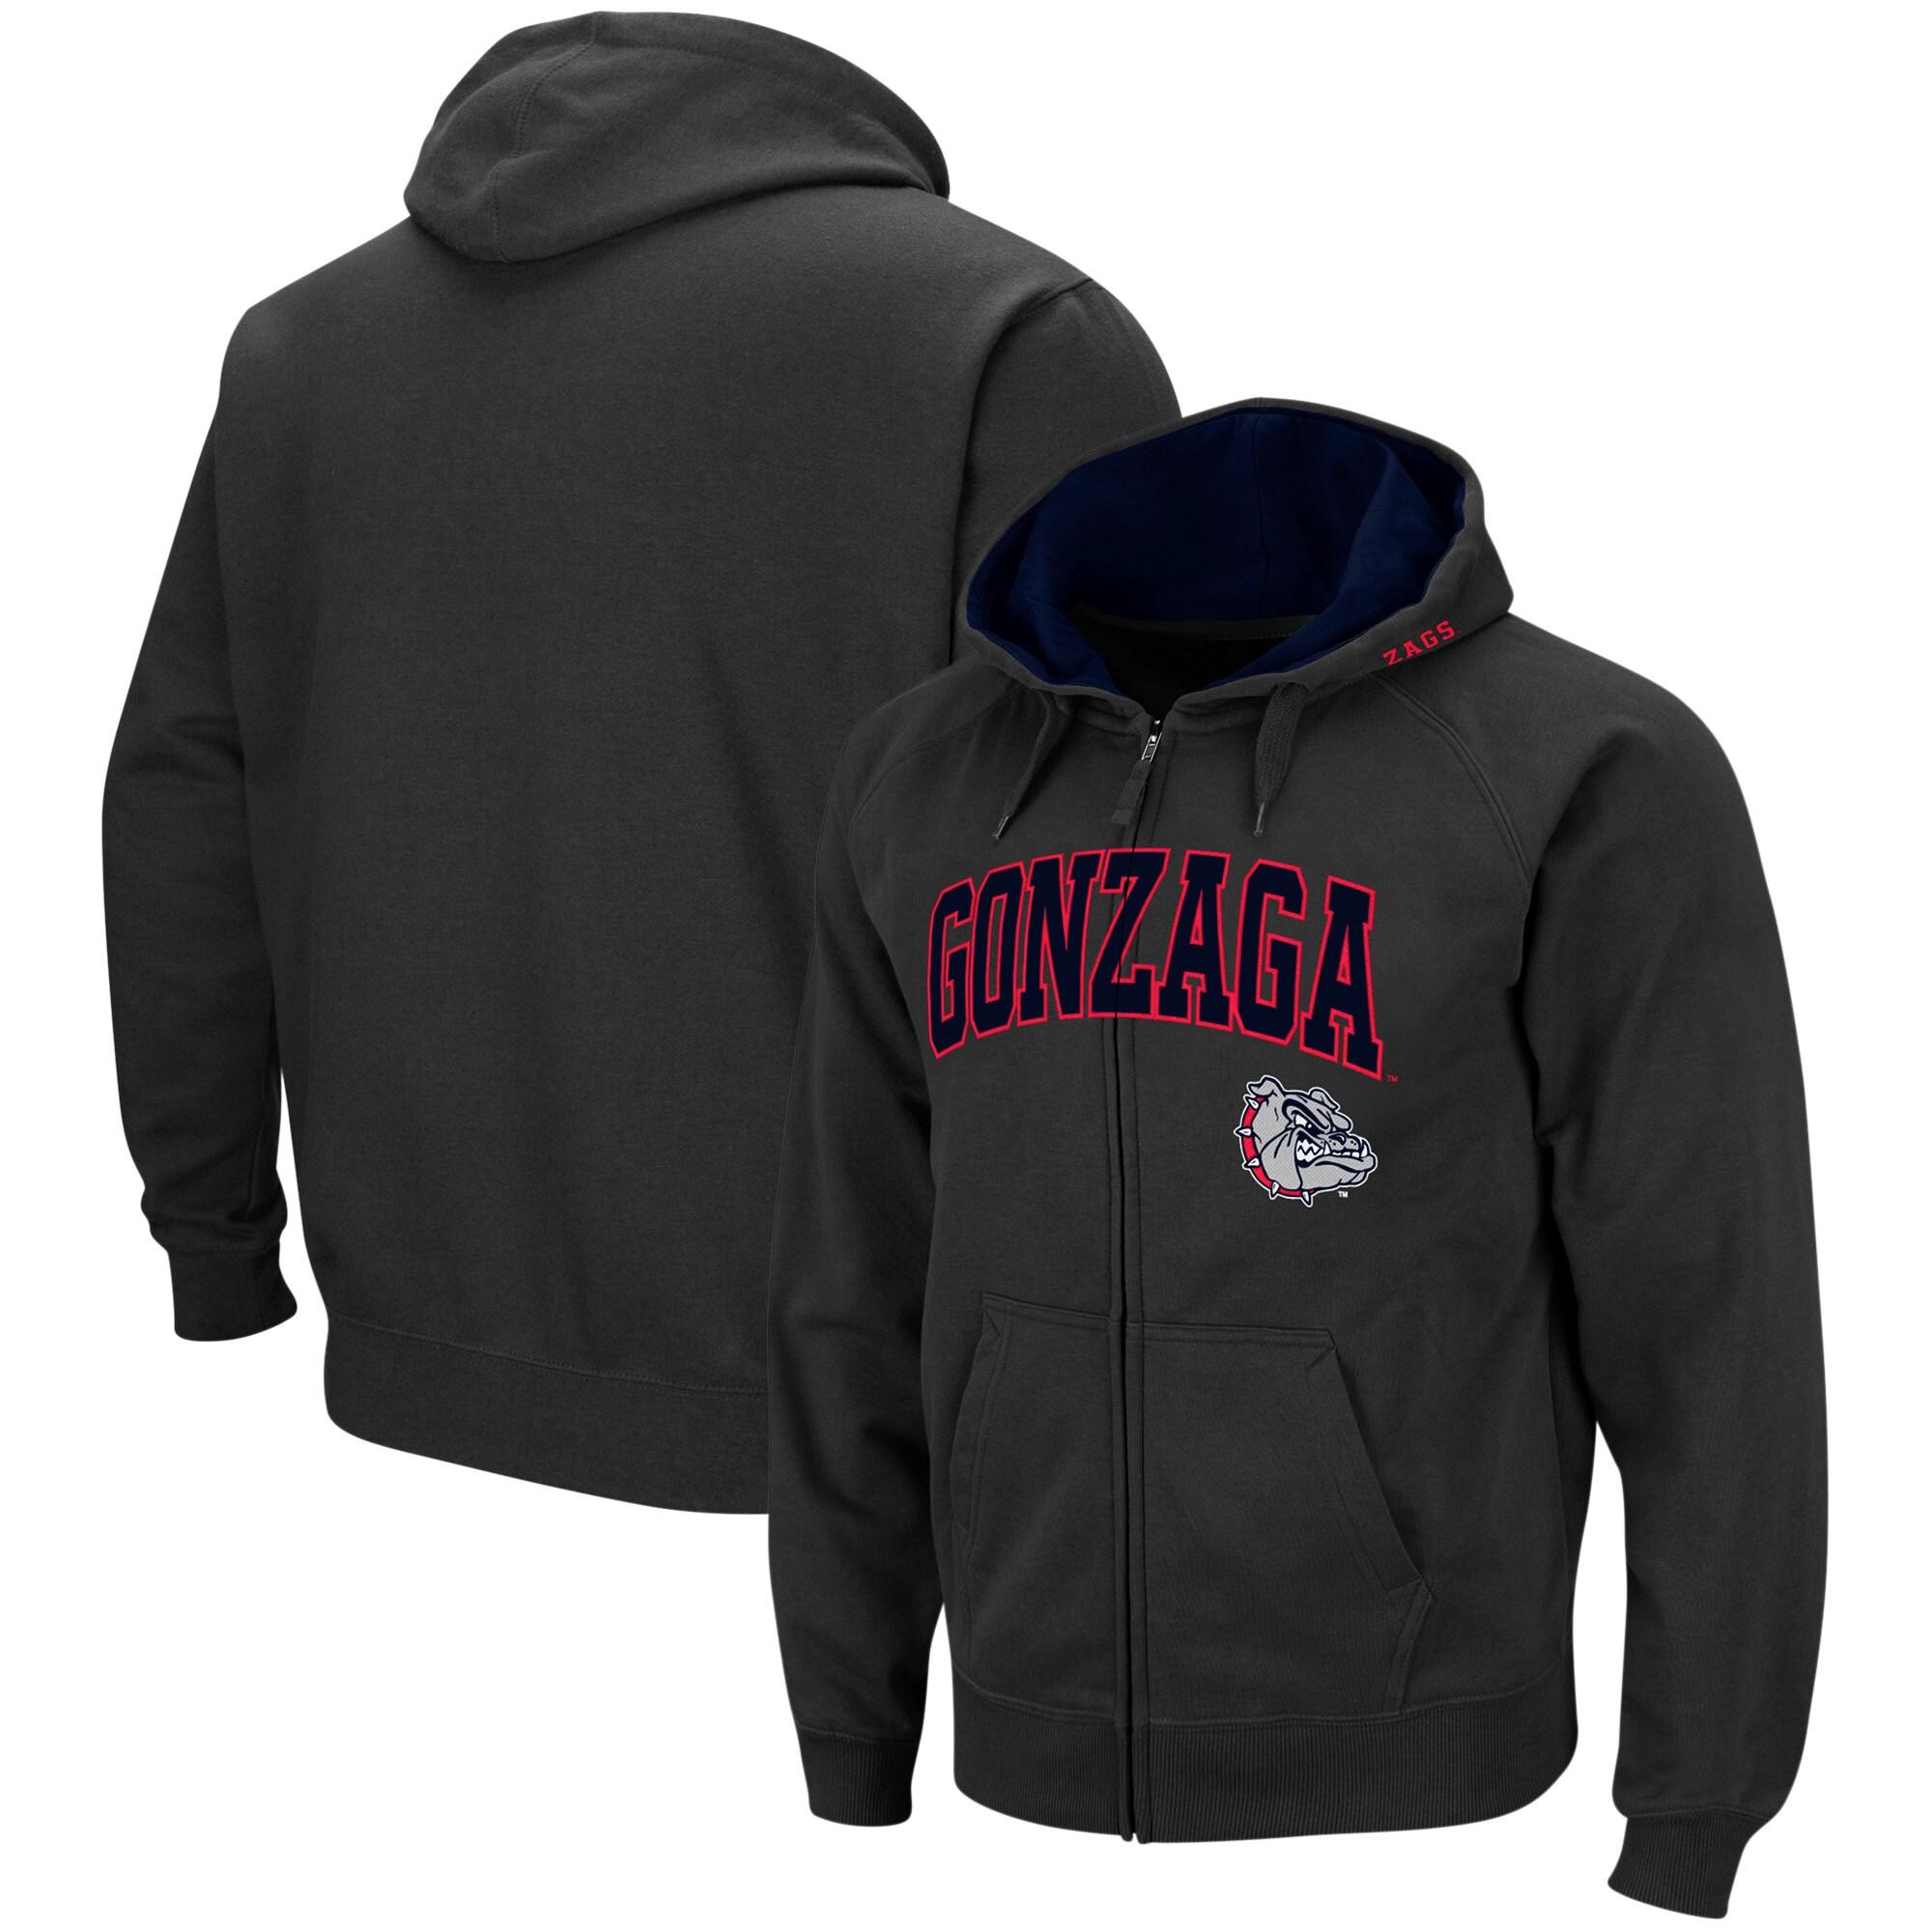 X-Large Elite Fan Shop NCAA Gonzaga Bulldogs Male Long Sleeve Shirt Dark Heather Arch Gray